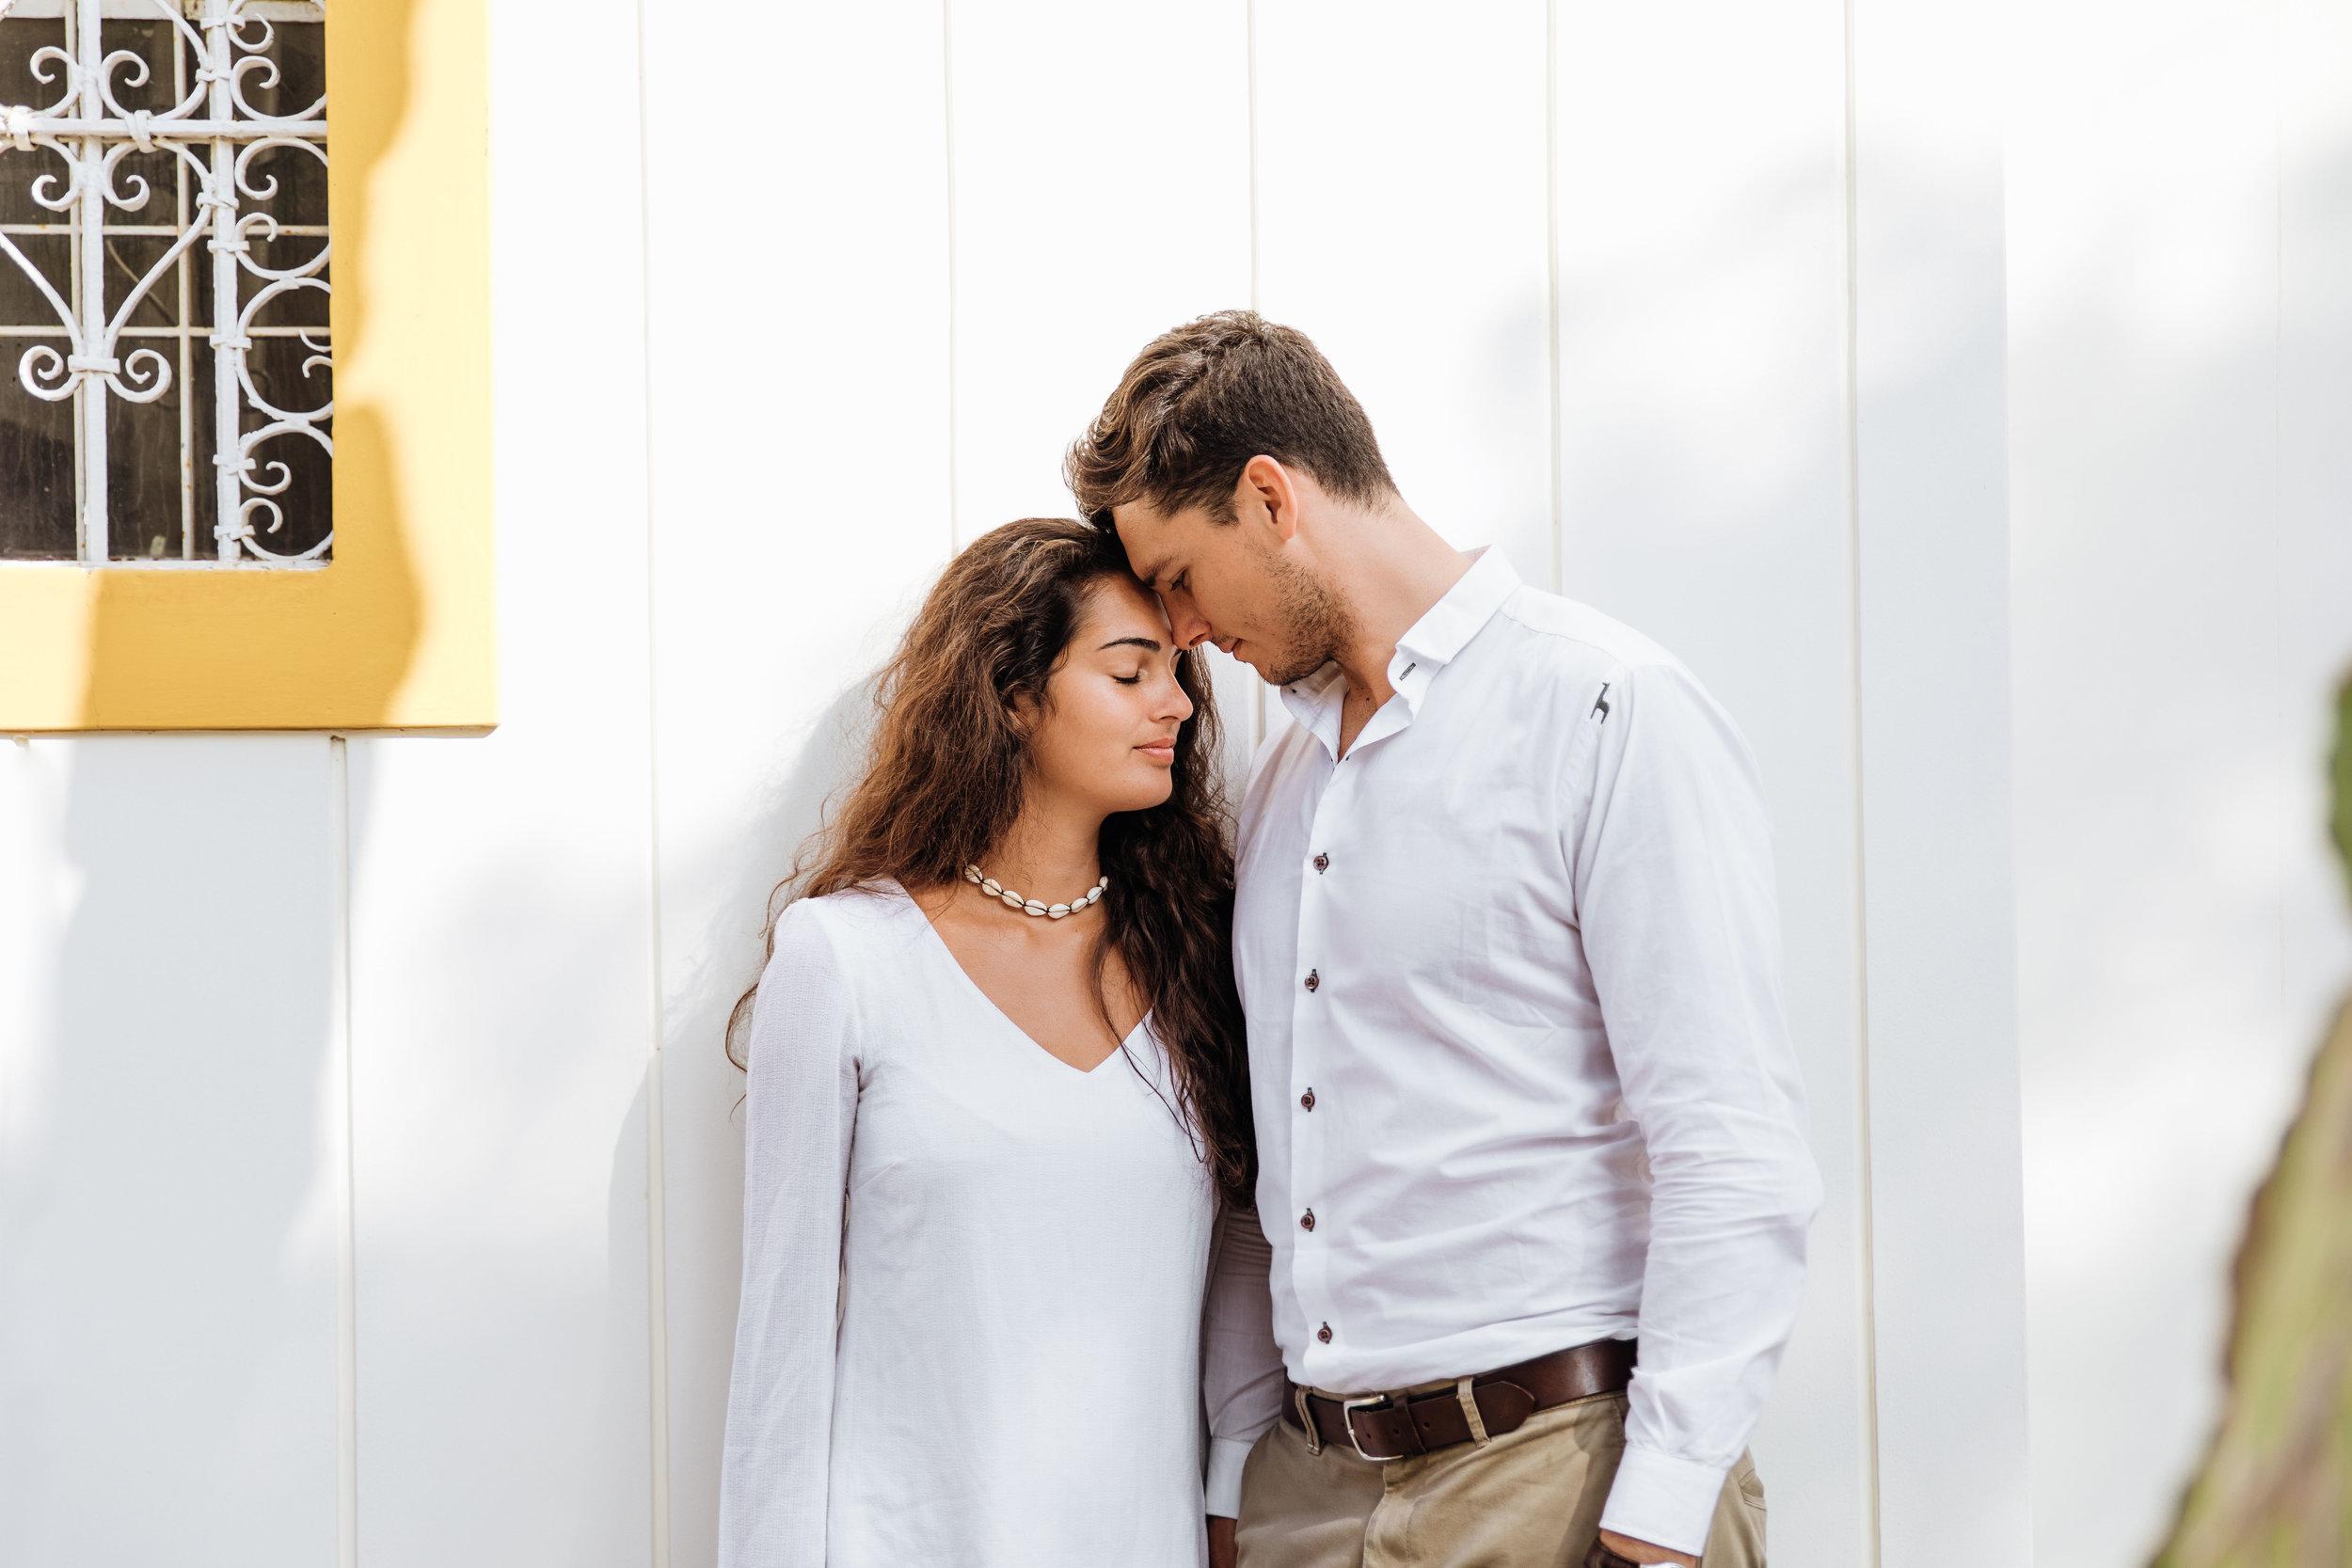 huacachina-peru-honeymoon-elopement-destination-wedding-photography-michael-cozzens-49.jpg